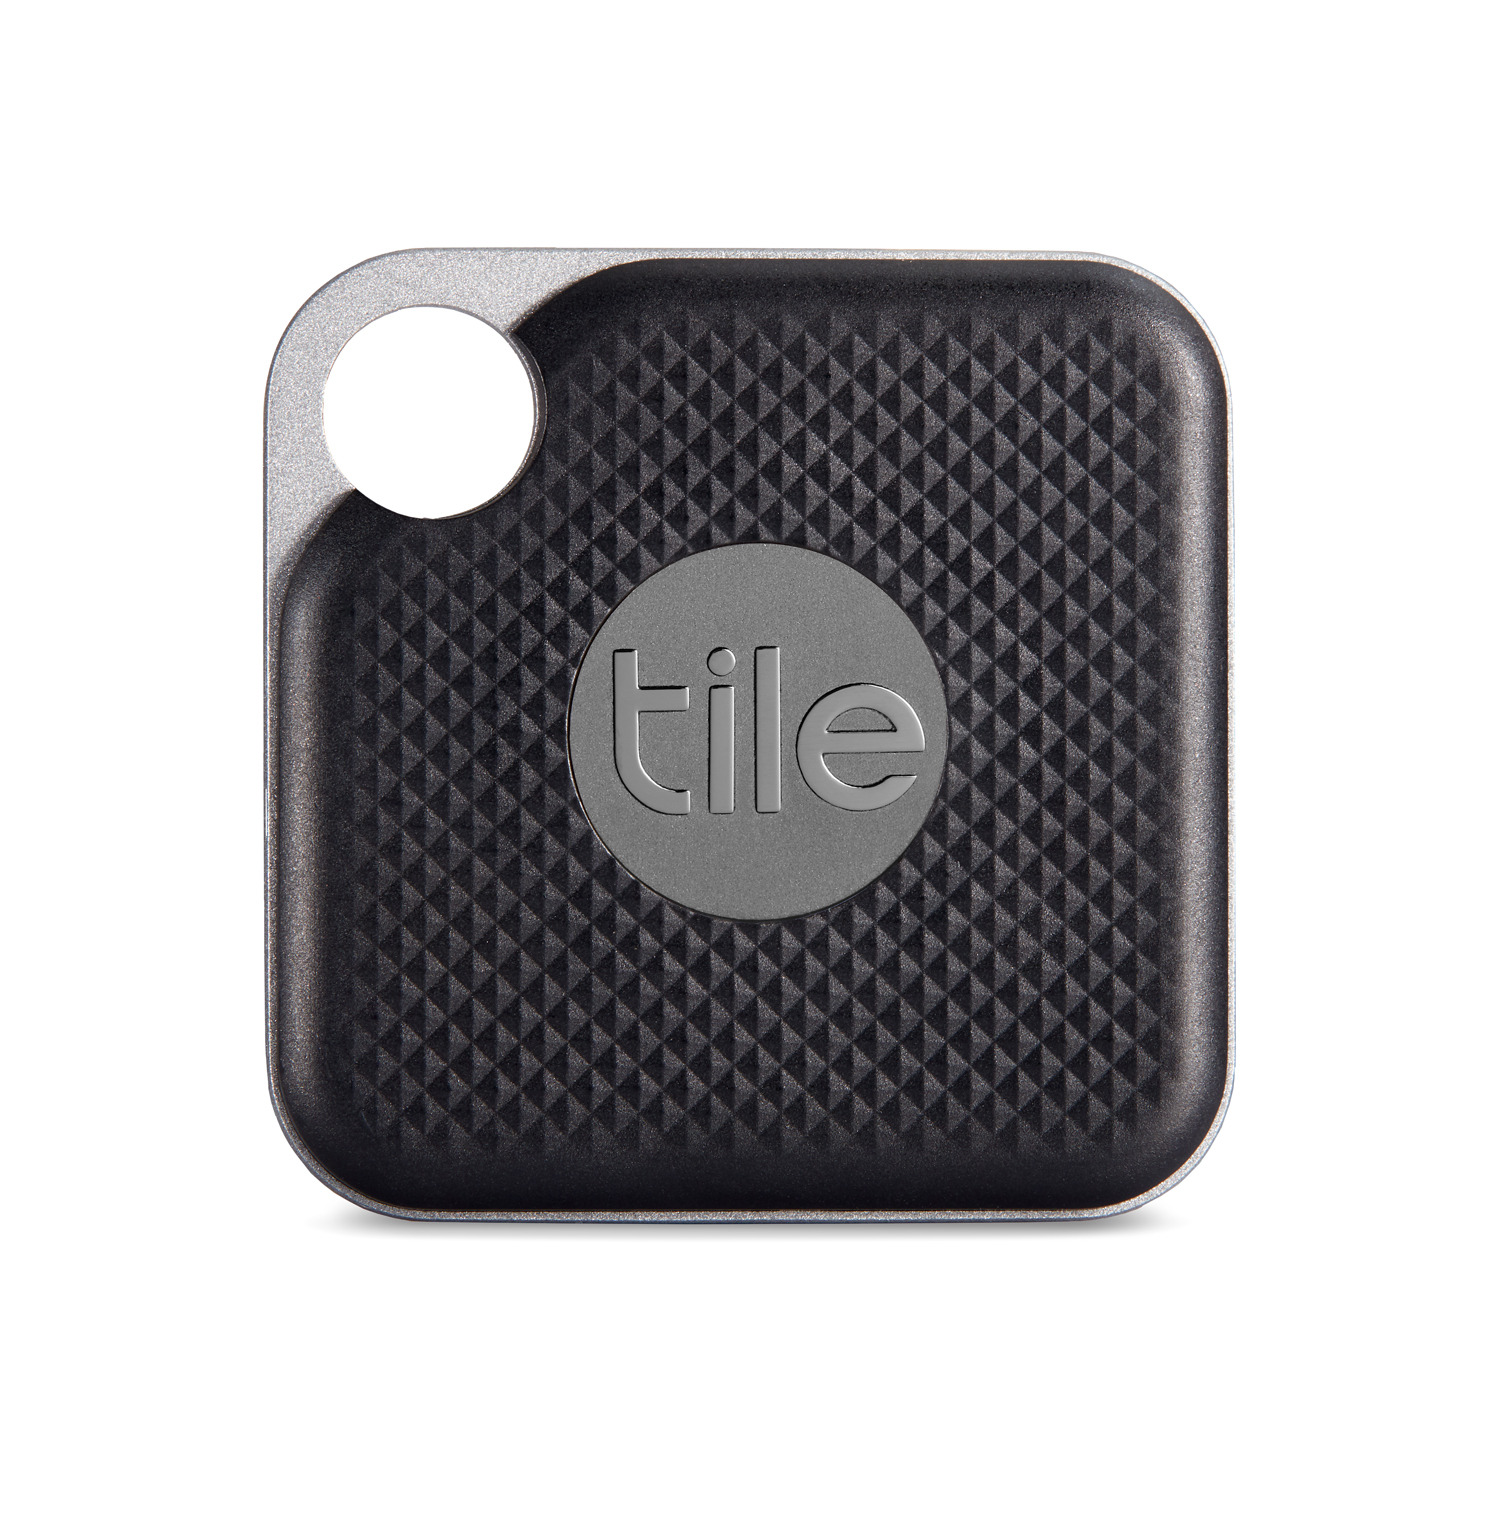 0f4ee5d4165 https   techcrunch.com 2019 01 07 petcubes-pet-cameras-now-work ...